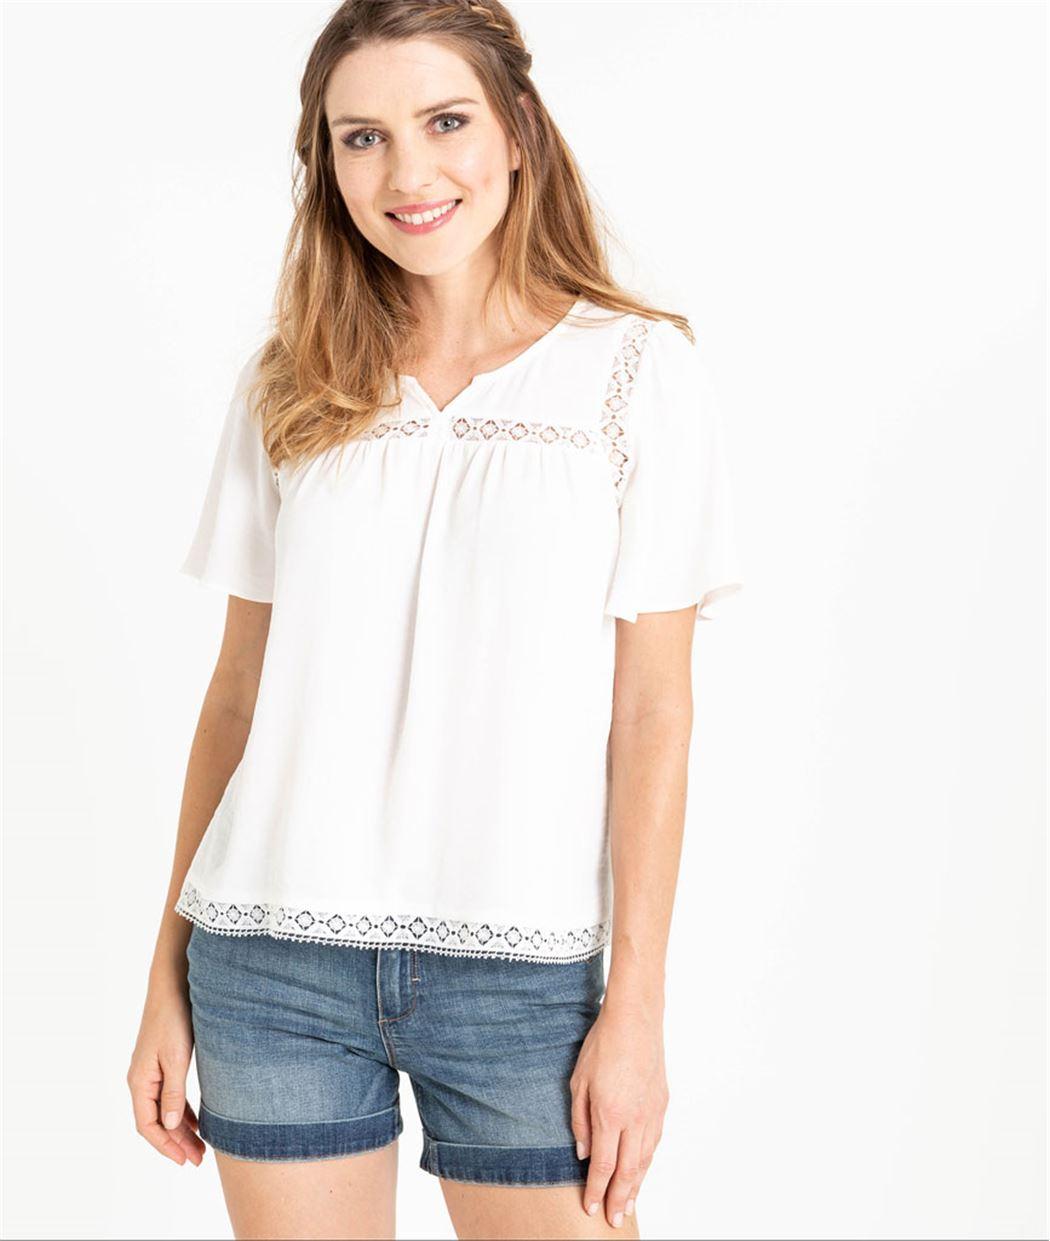 Blouse femme blanche avec dentelle ECRU